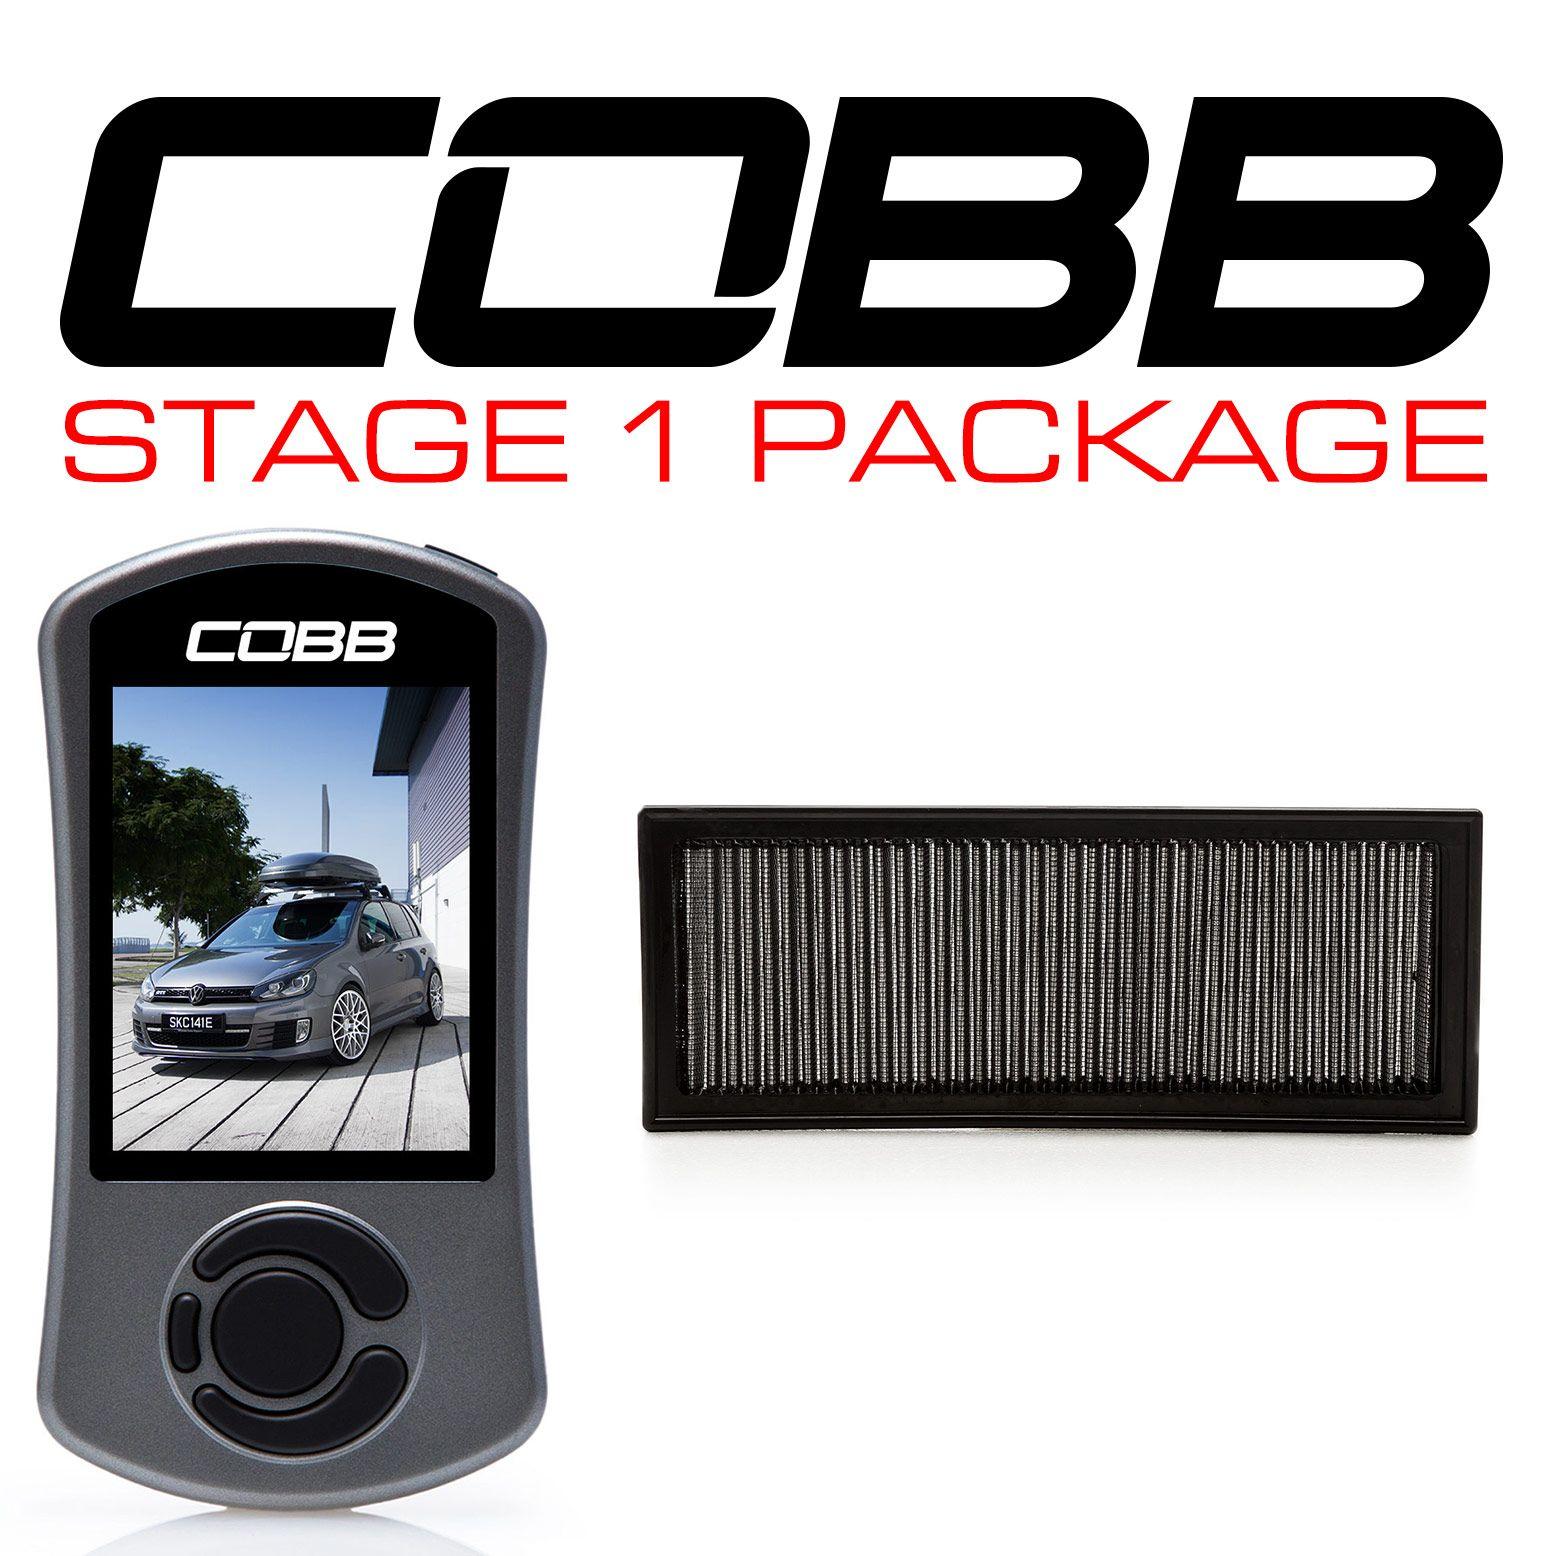 COBB AccessPORT V3 ECU Flash Tuner for 2010-14 VW Golf GTI [MK VI] AP3-VLK-001